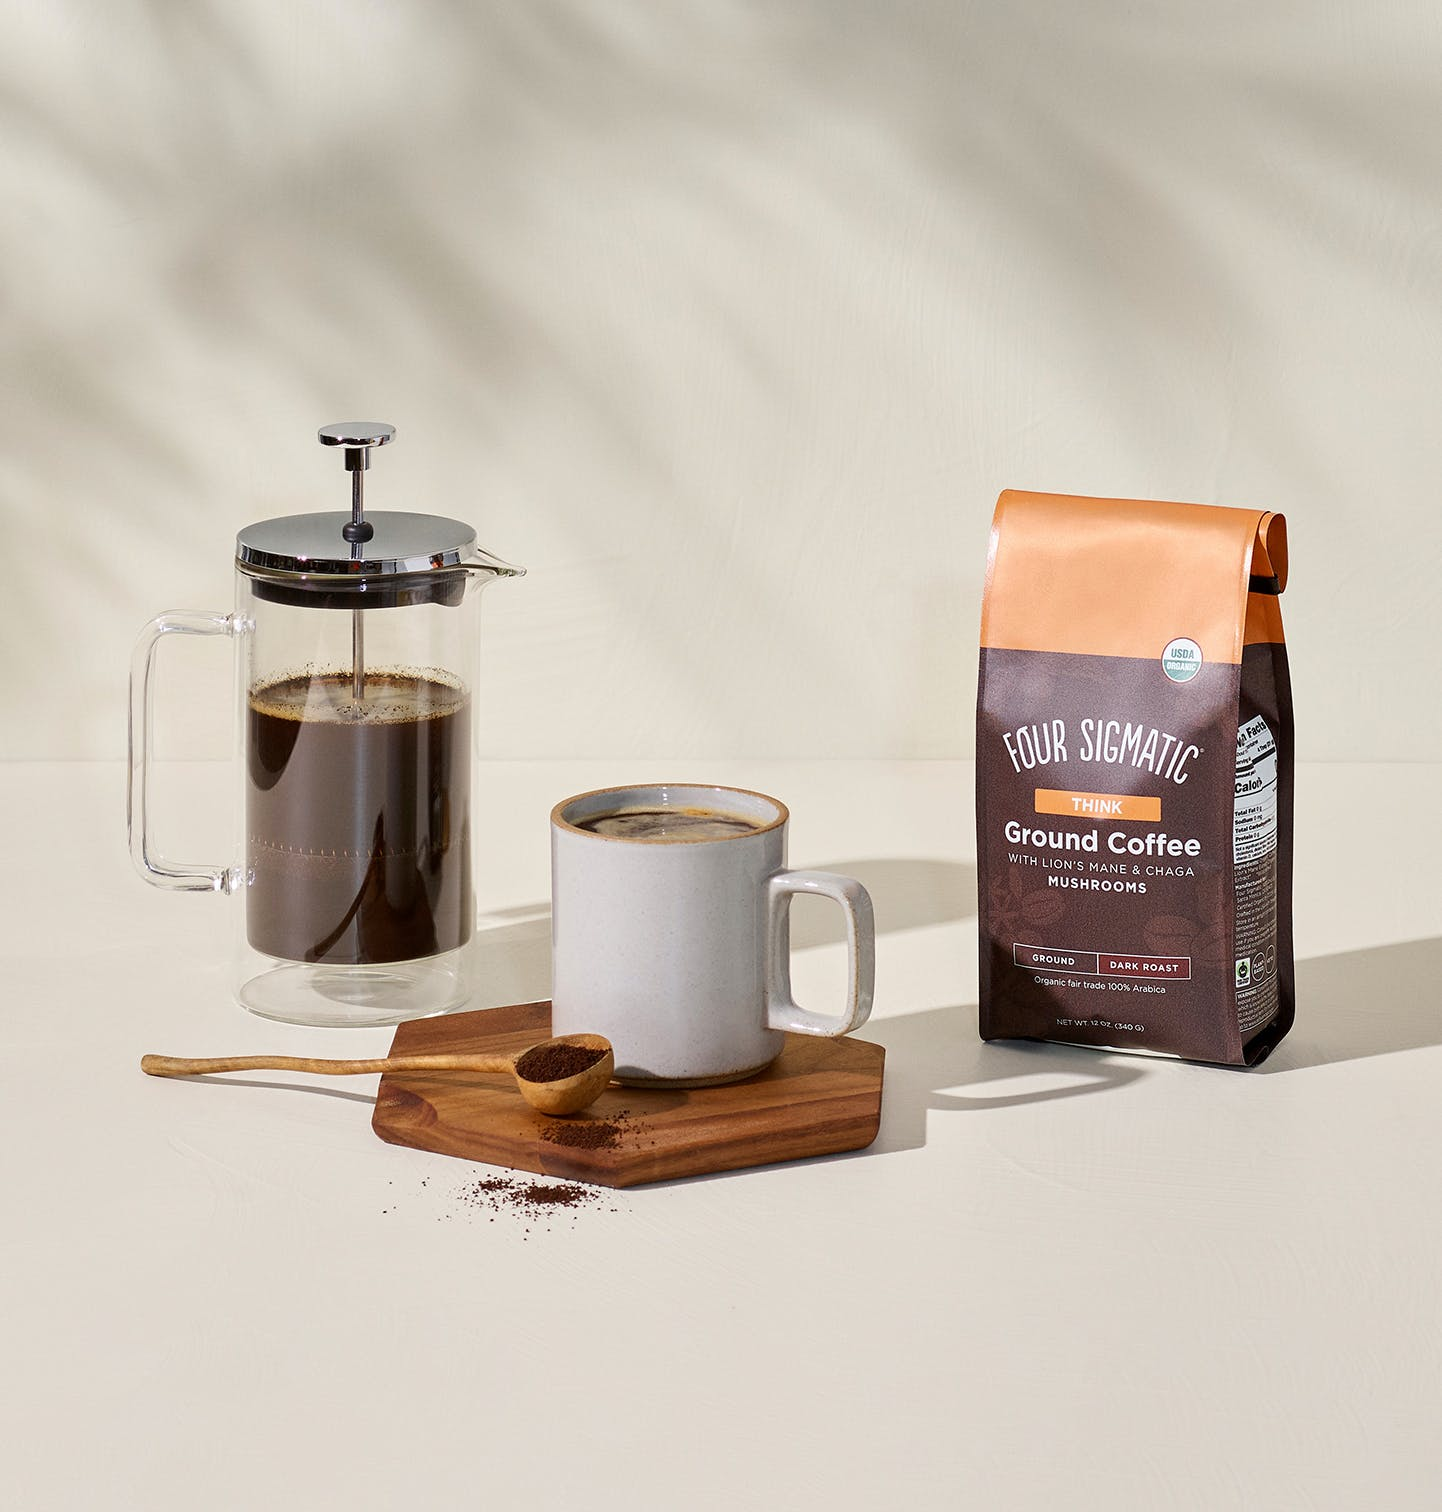 Think Ground Coffee